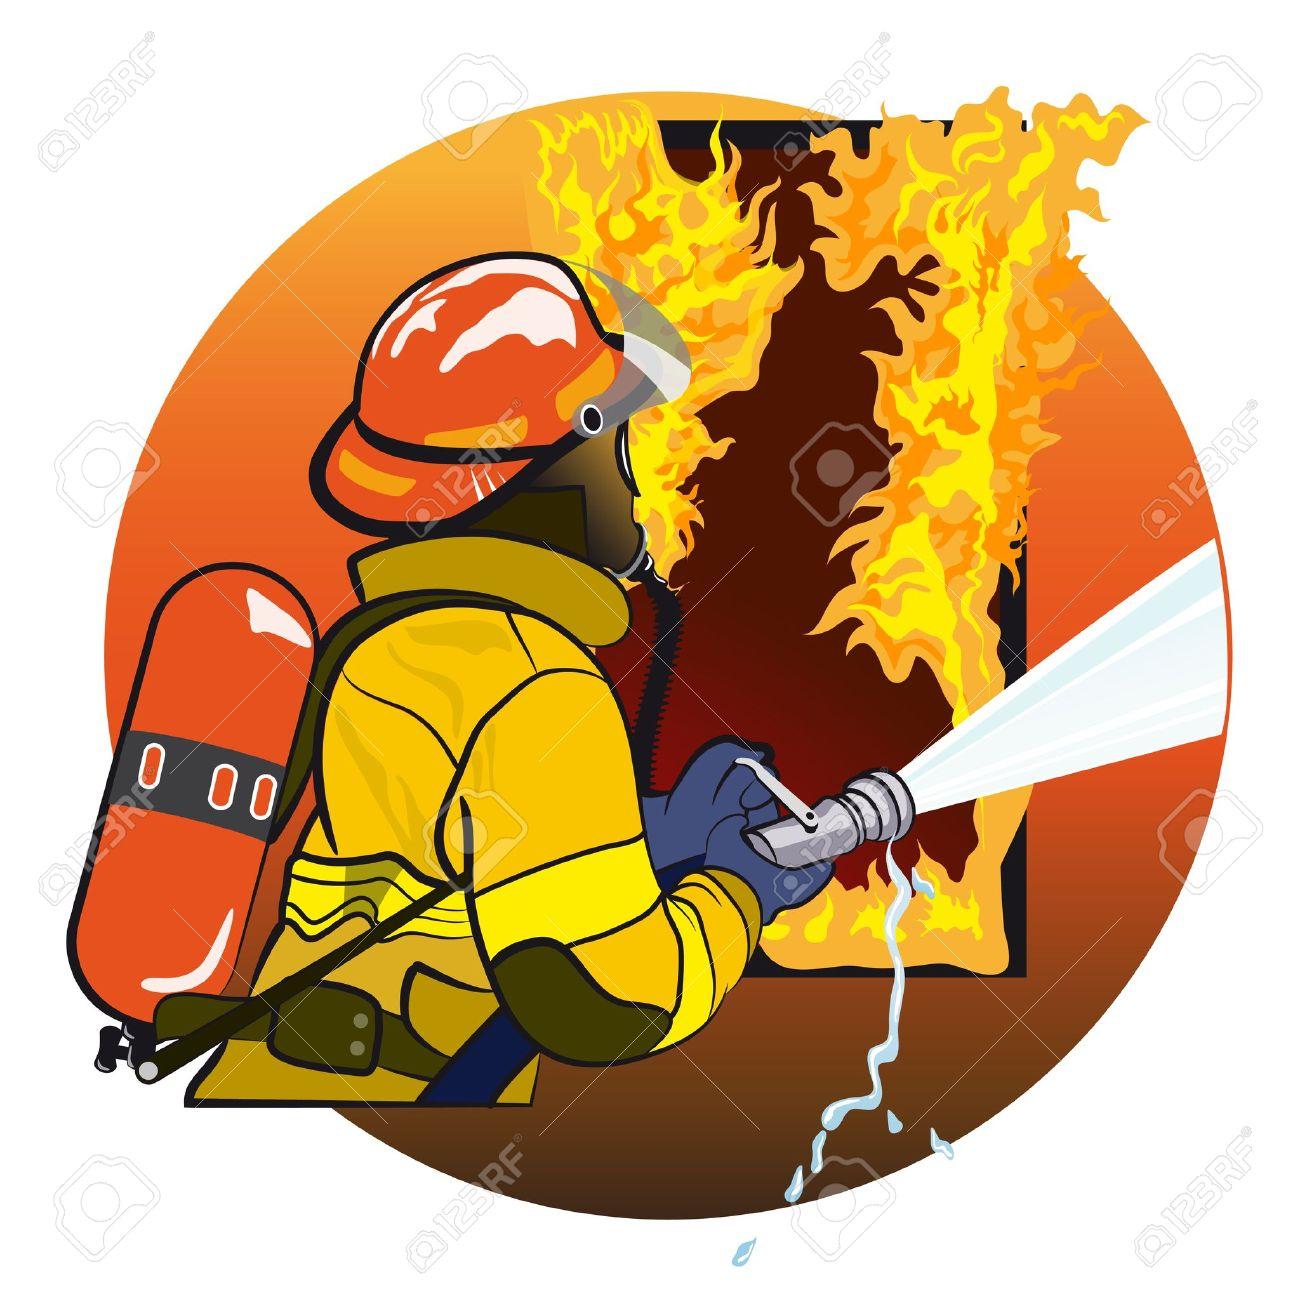 http://previews.123rf.com/images/p6m5/p6m51204/p6m5120400003/13037677-Firefighter-extinguishes-fire-The-emblem--Stock-Vector-fireman.jpg